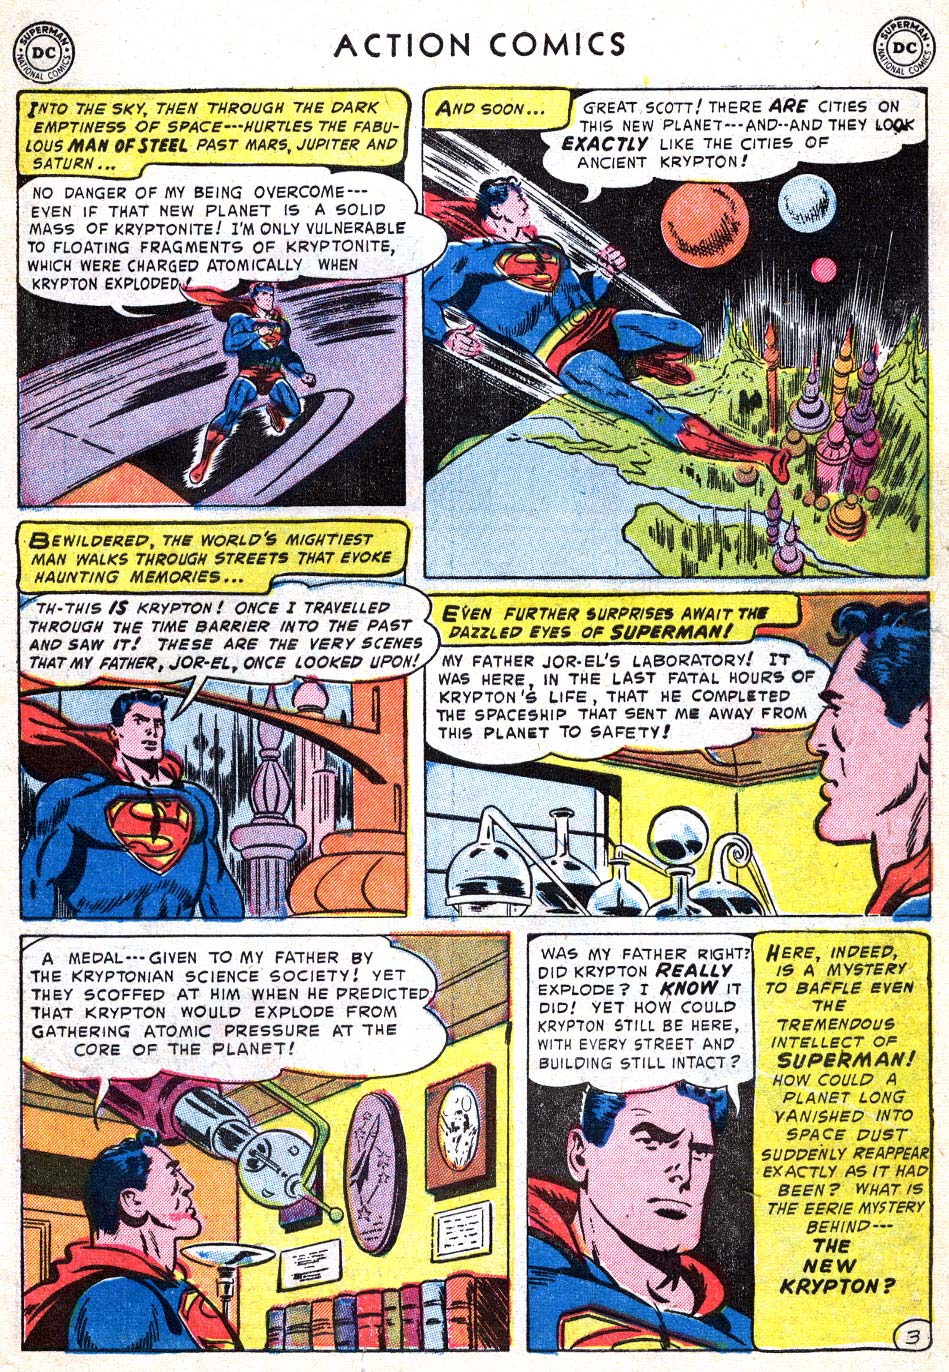 Action Comics (1938) 182 Page 4